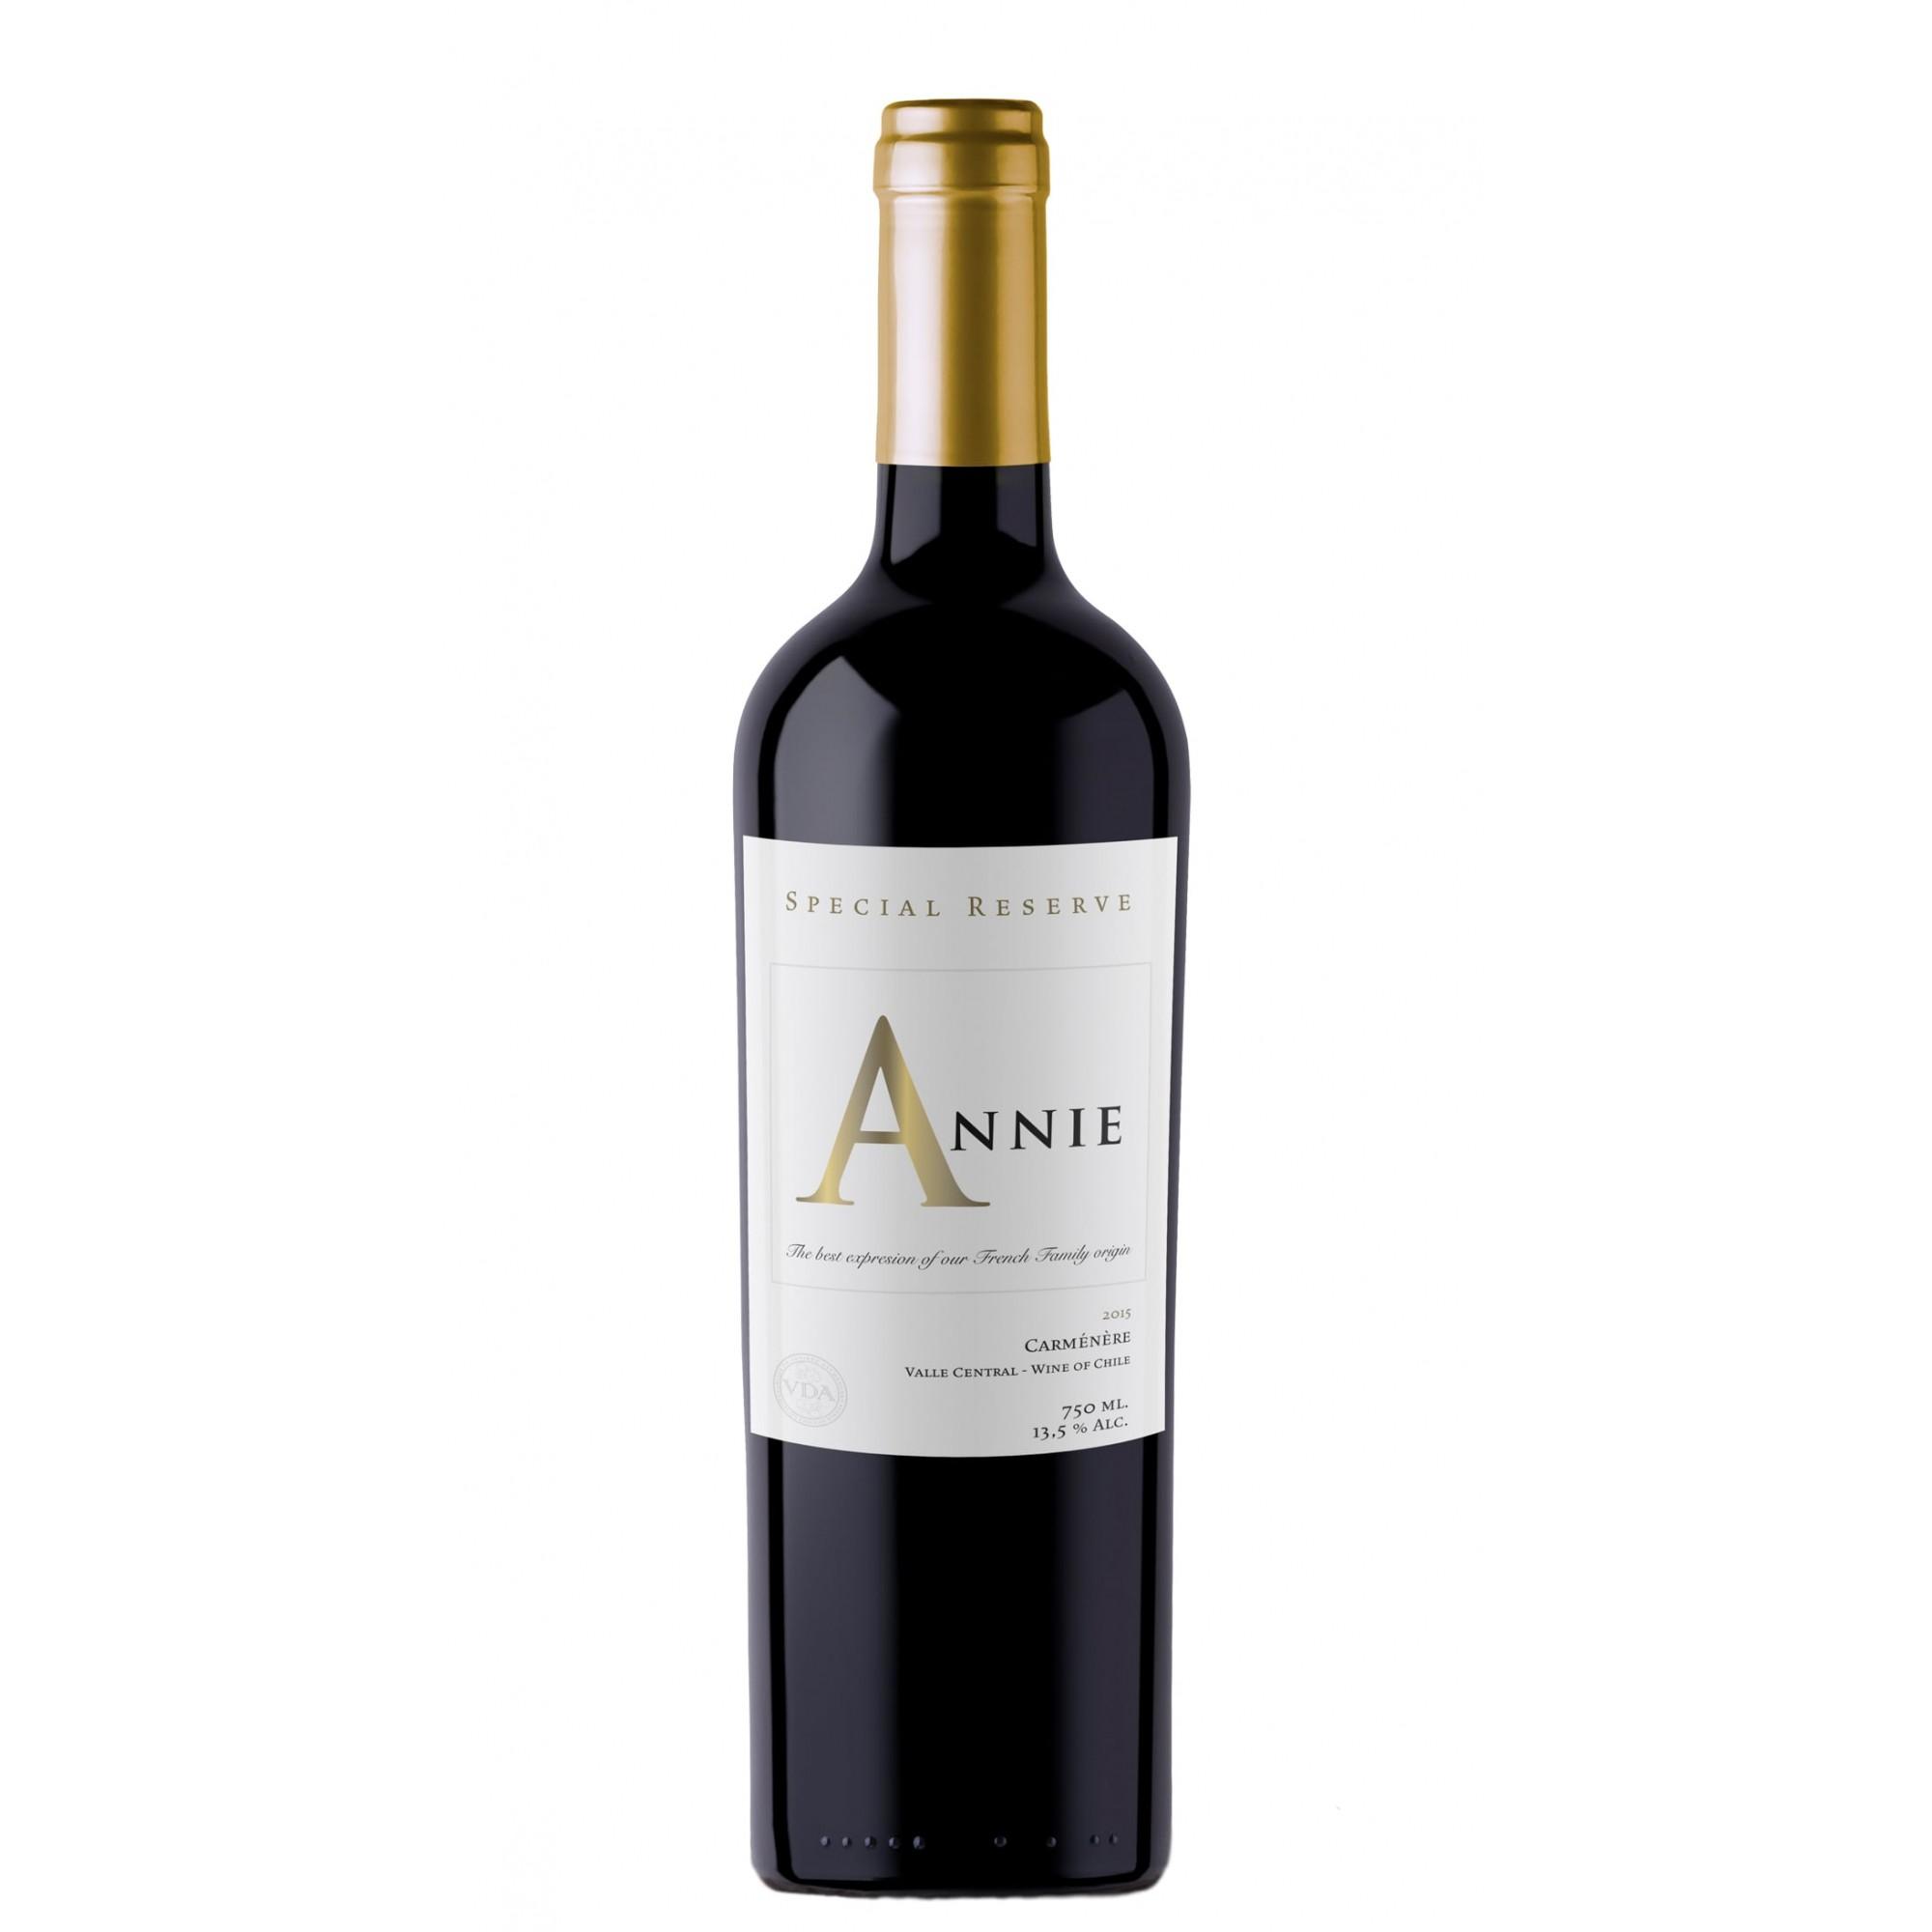 Annie Special Reserve Carmenere